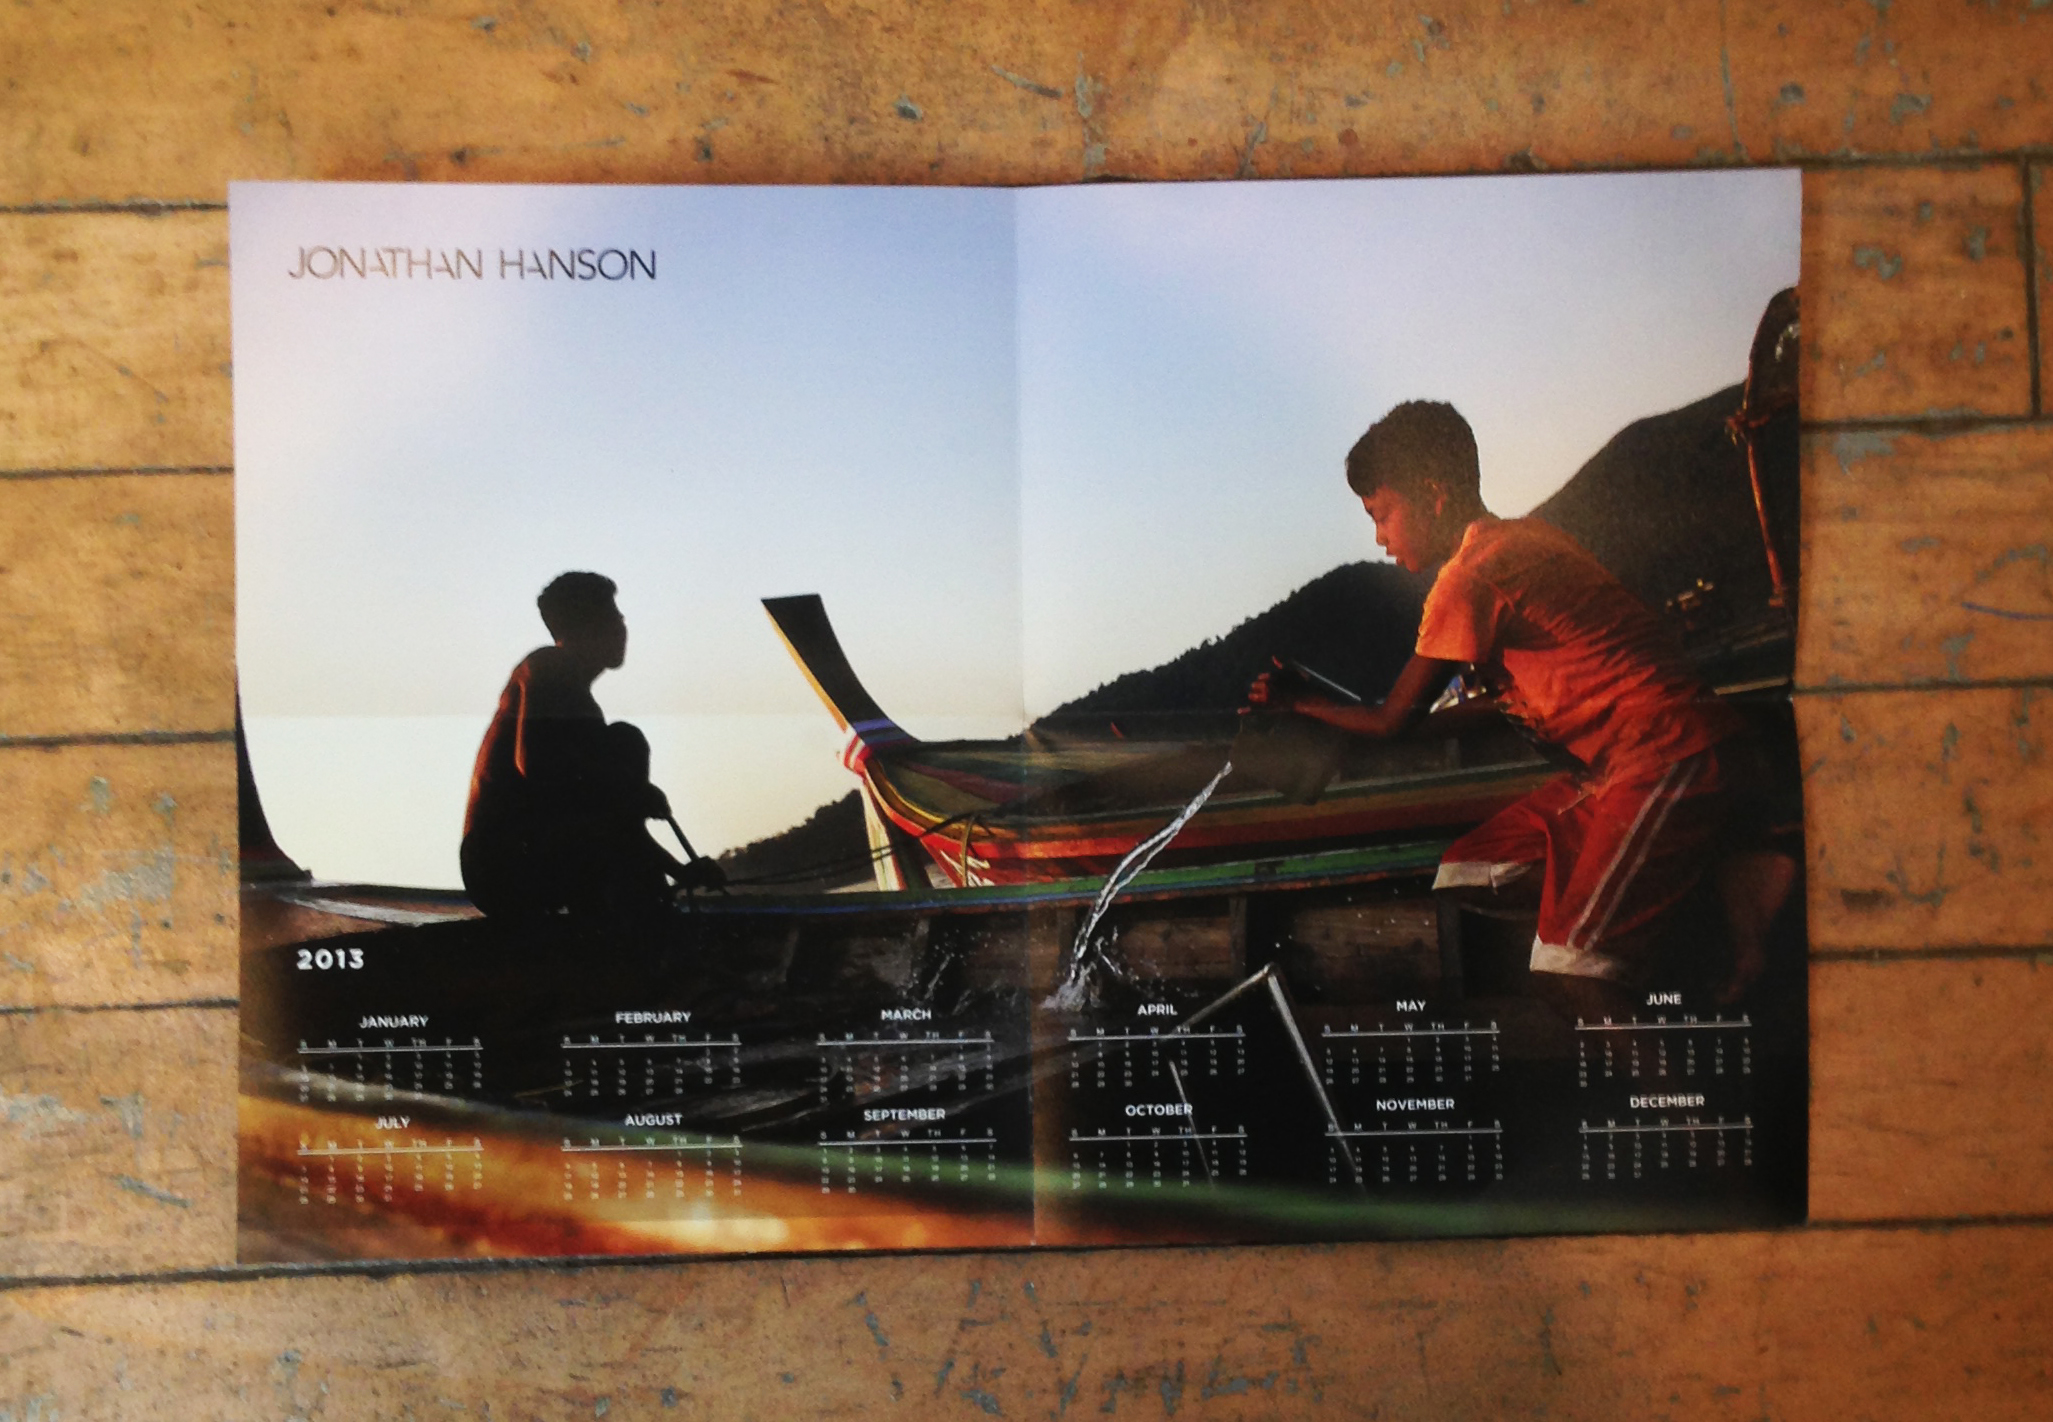 Photo promo by photographer Jonathan Hanson